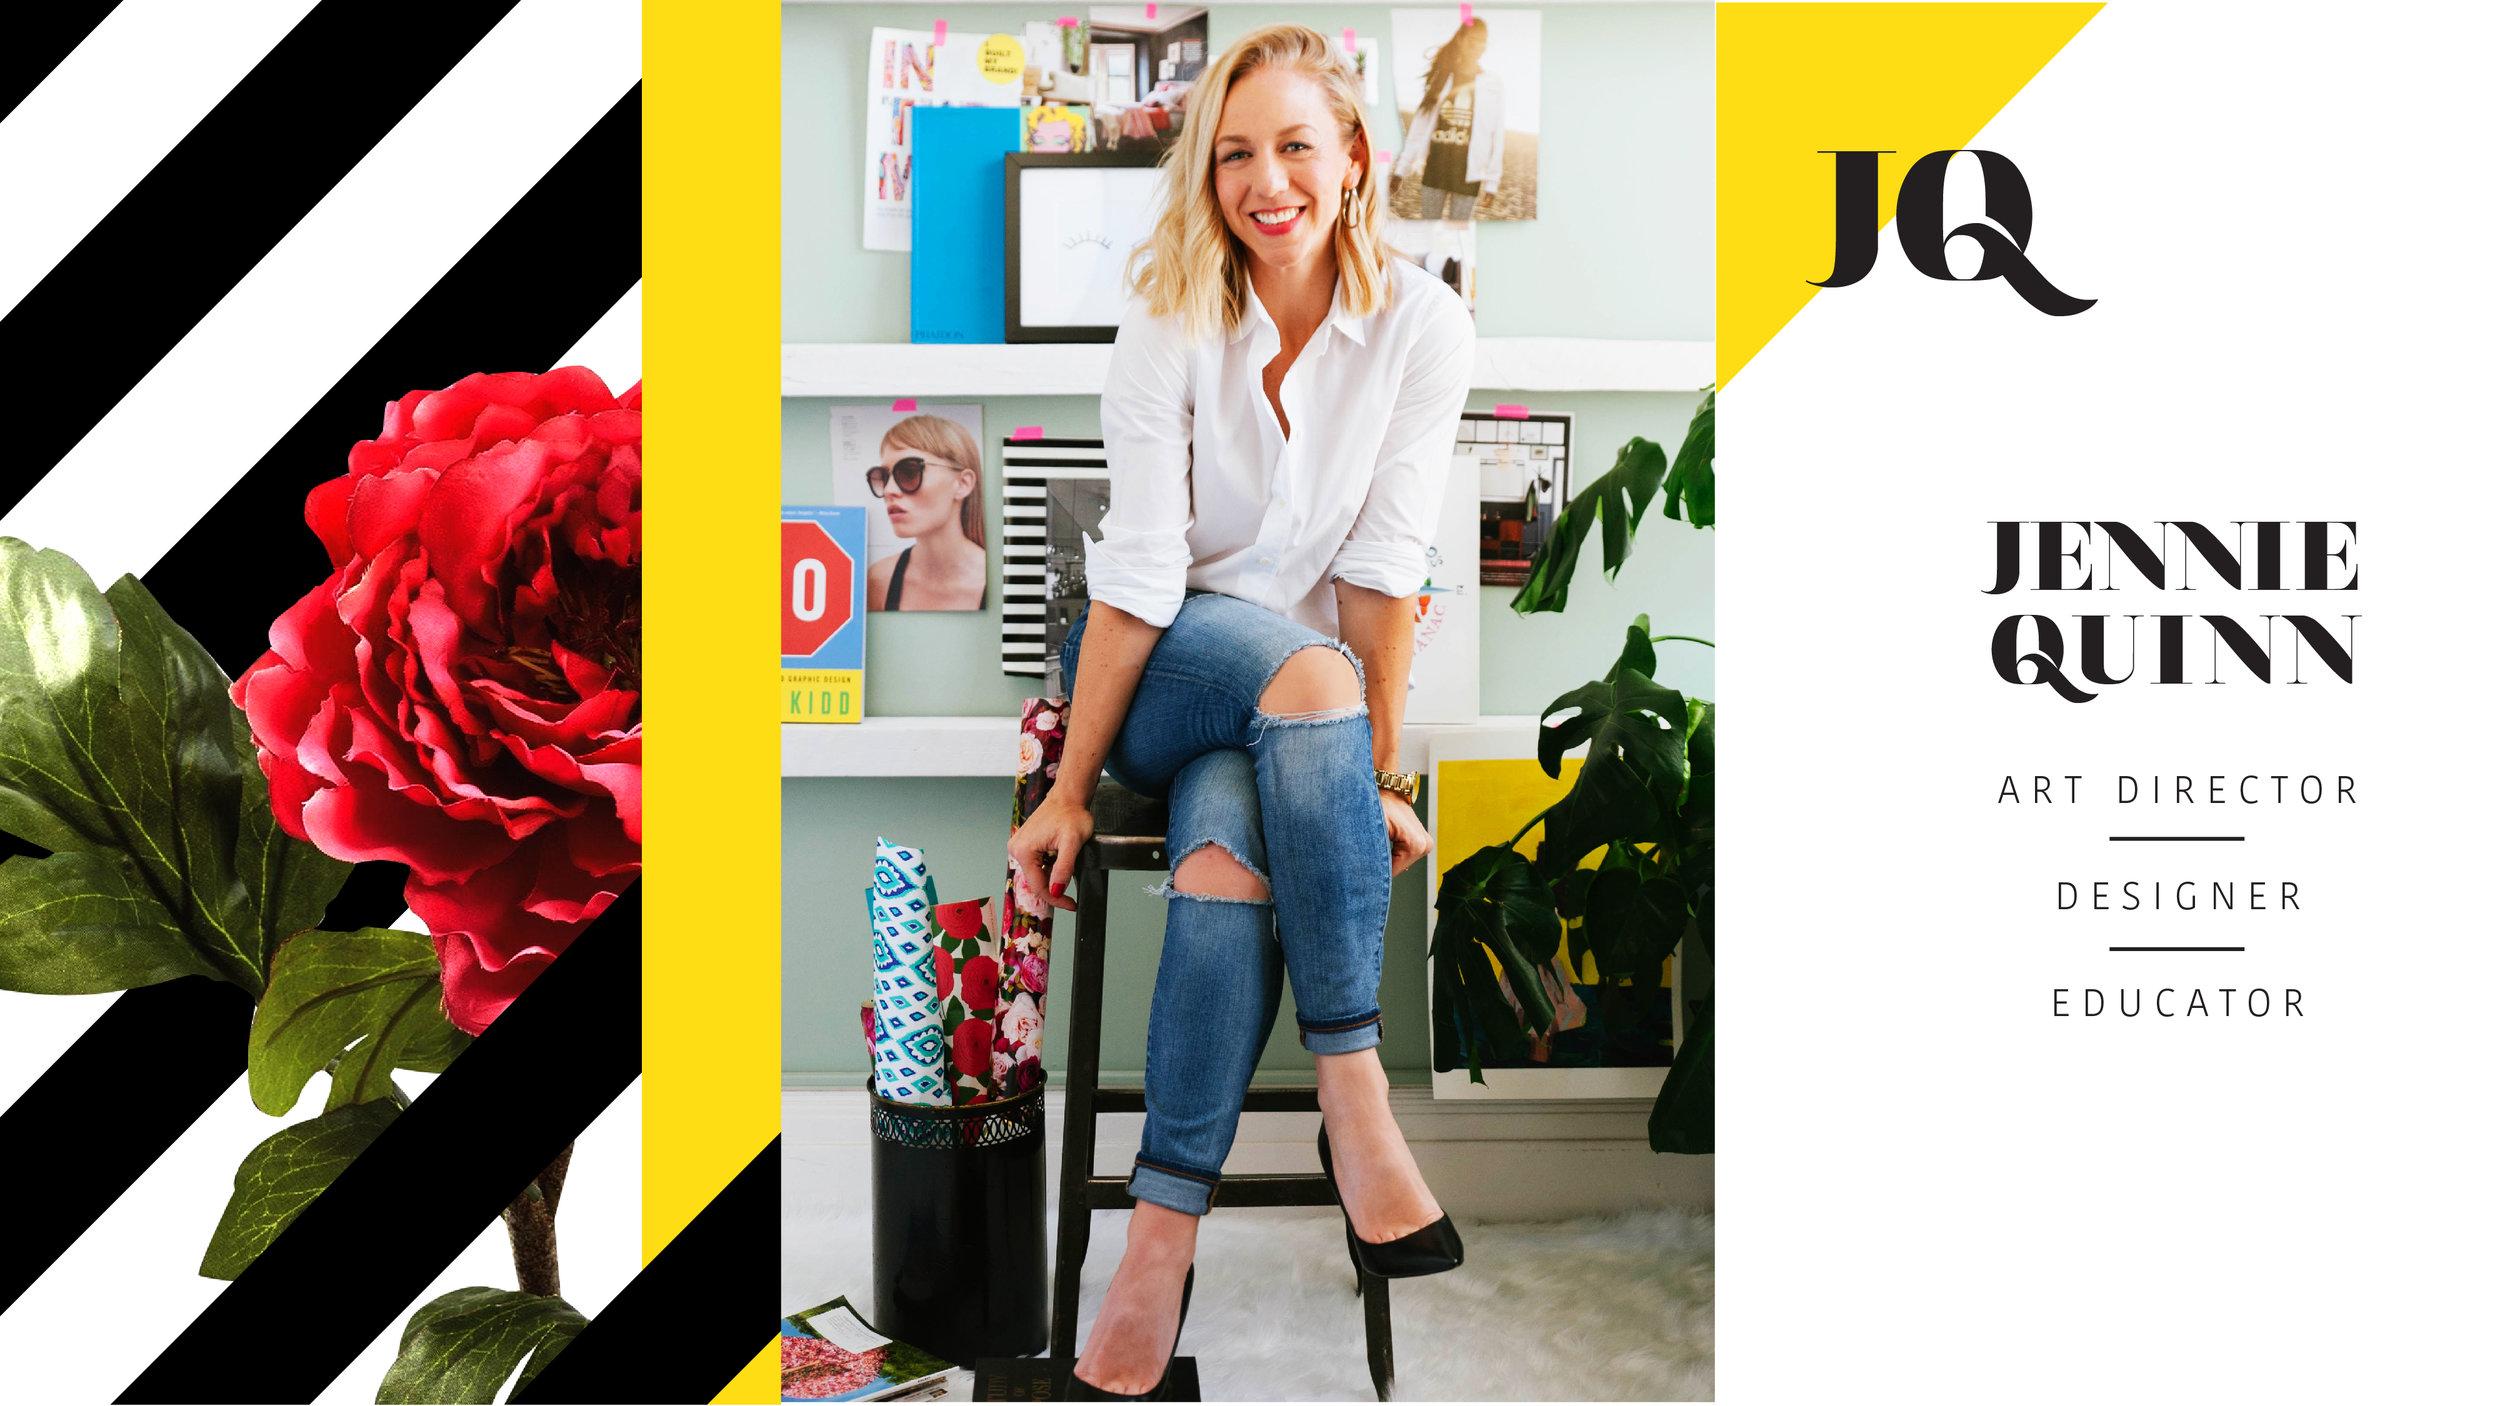 Jennie Quinn | Art Director | Designer | Educator